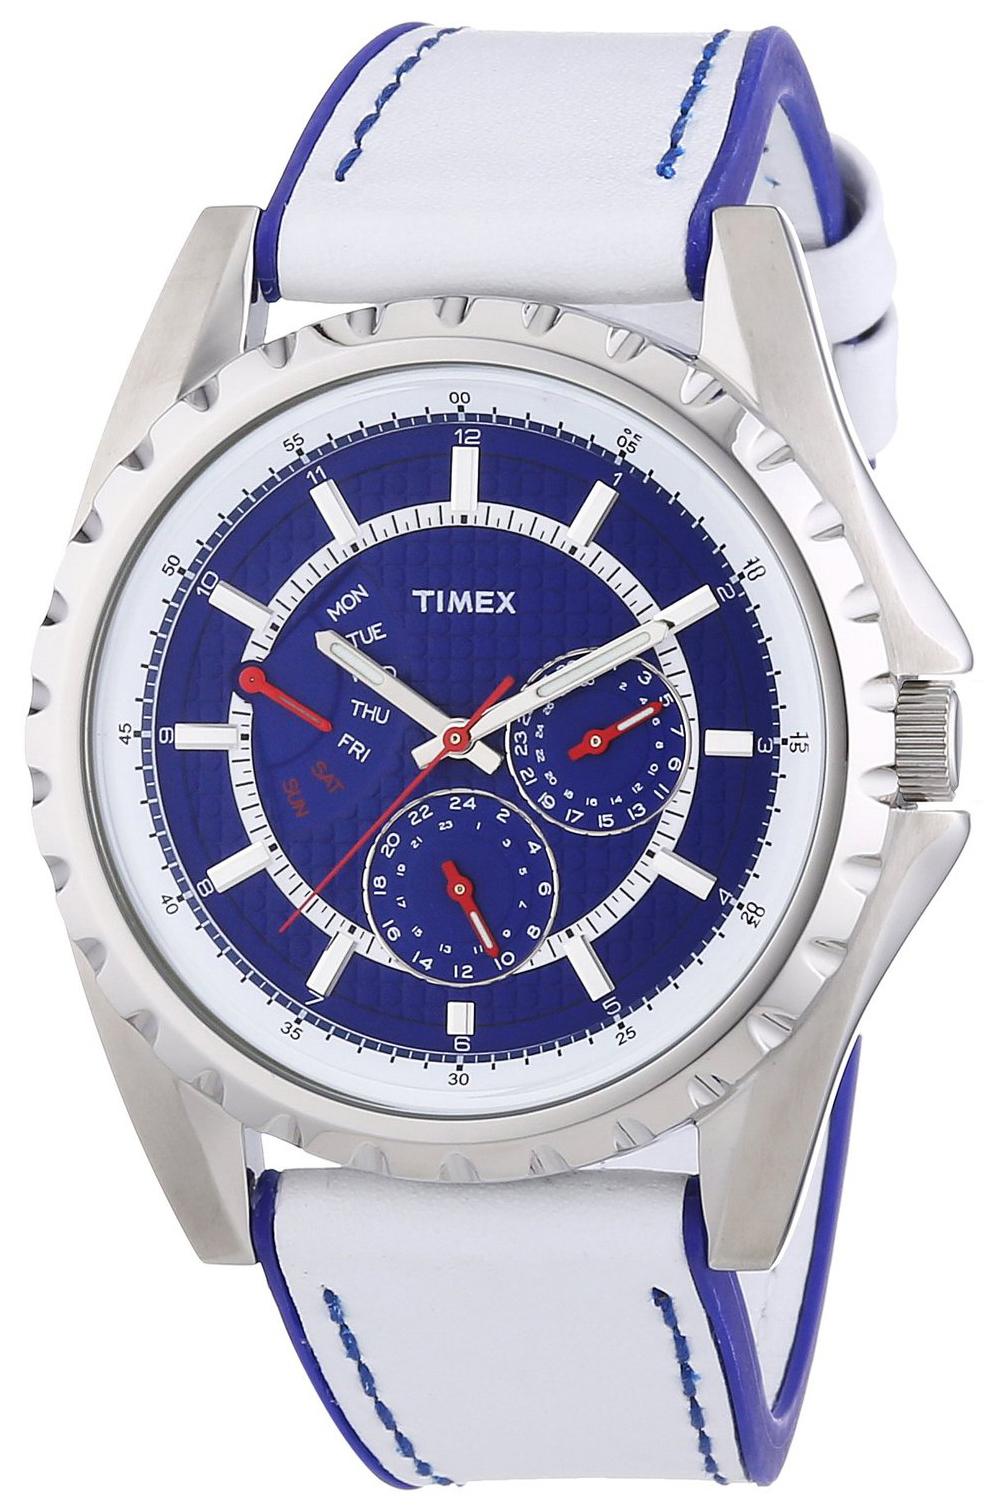 Timex 99999 Herrklocka T2N110 Blå/Läder Ø42 mm - Timex